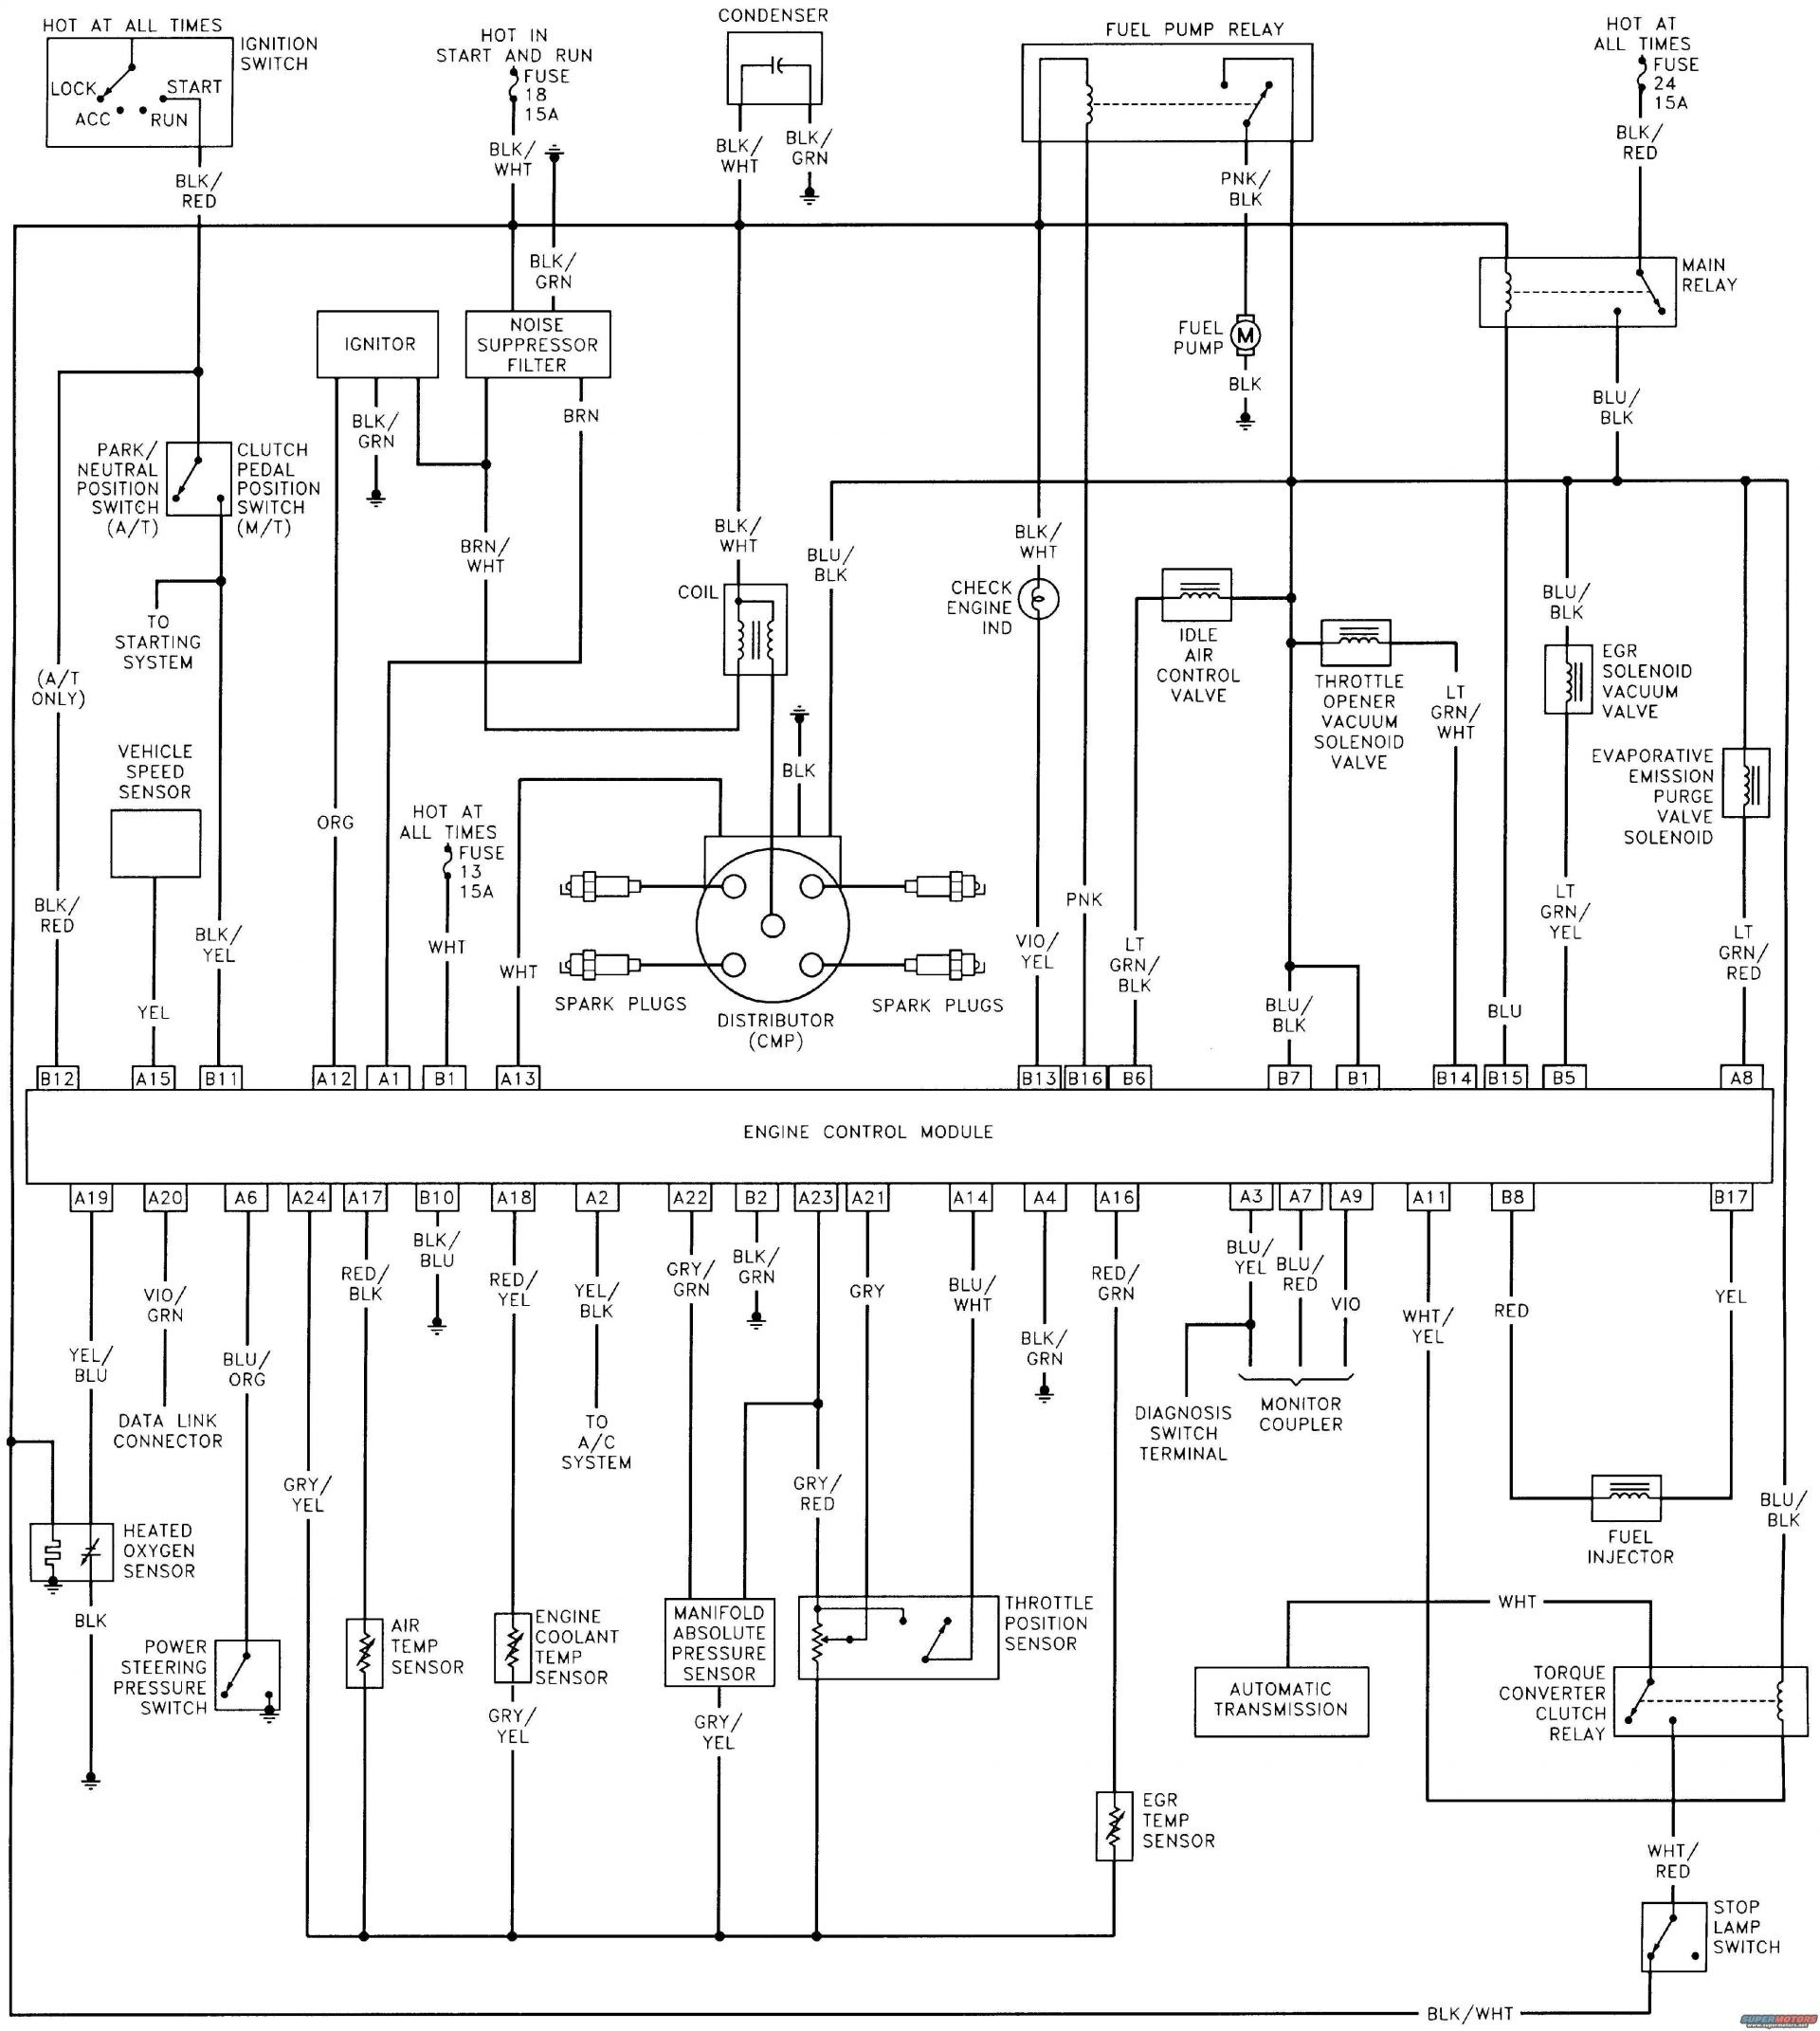 Clark Gts25mc forklift Wiring Diagram Clark forklift Ignition Switch Wiring Diagram Collection Of Clark Gts25mc forklift Wiring Diagram